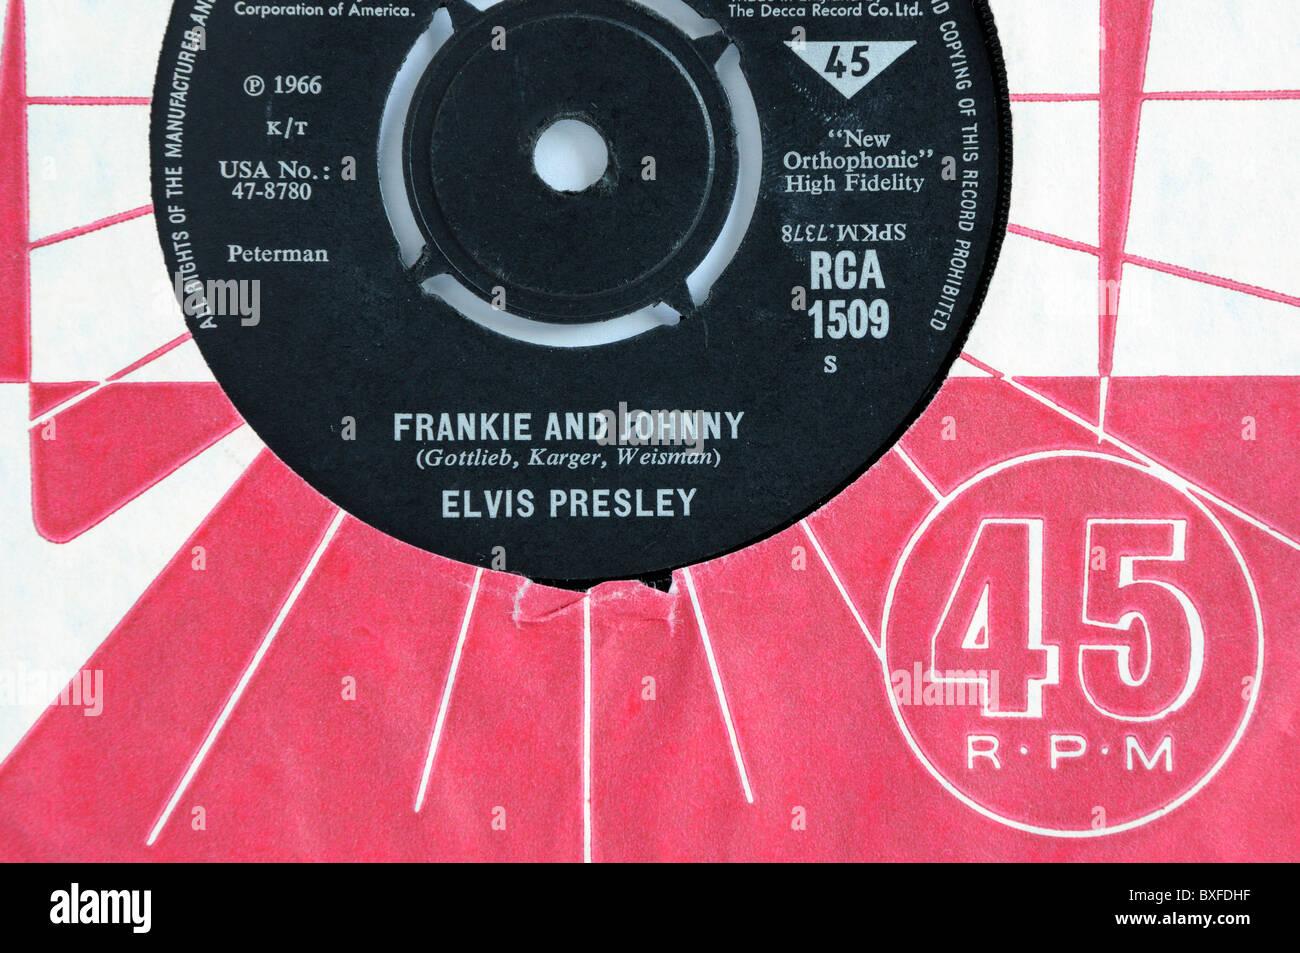 "Elvis Presley's 1966 record ""Frankie and Johnny"". Stock Photo"